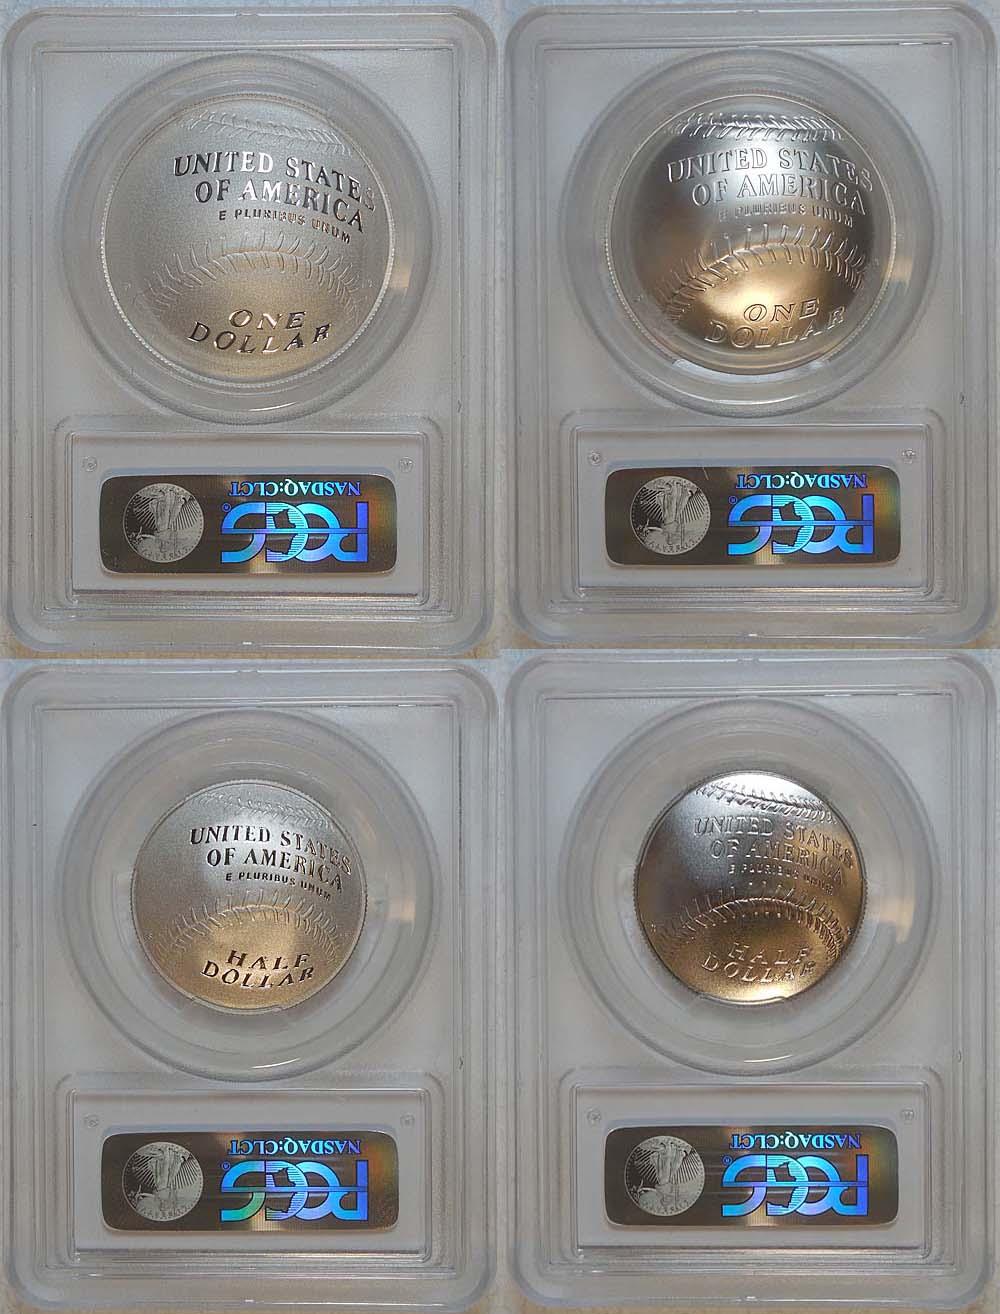 2014 baseball hall of fame commemorative 4 coin set pcgs pr 69